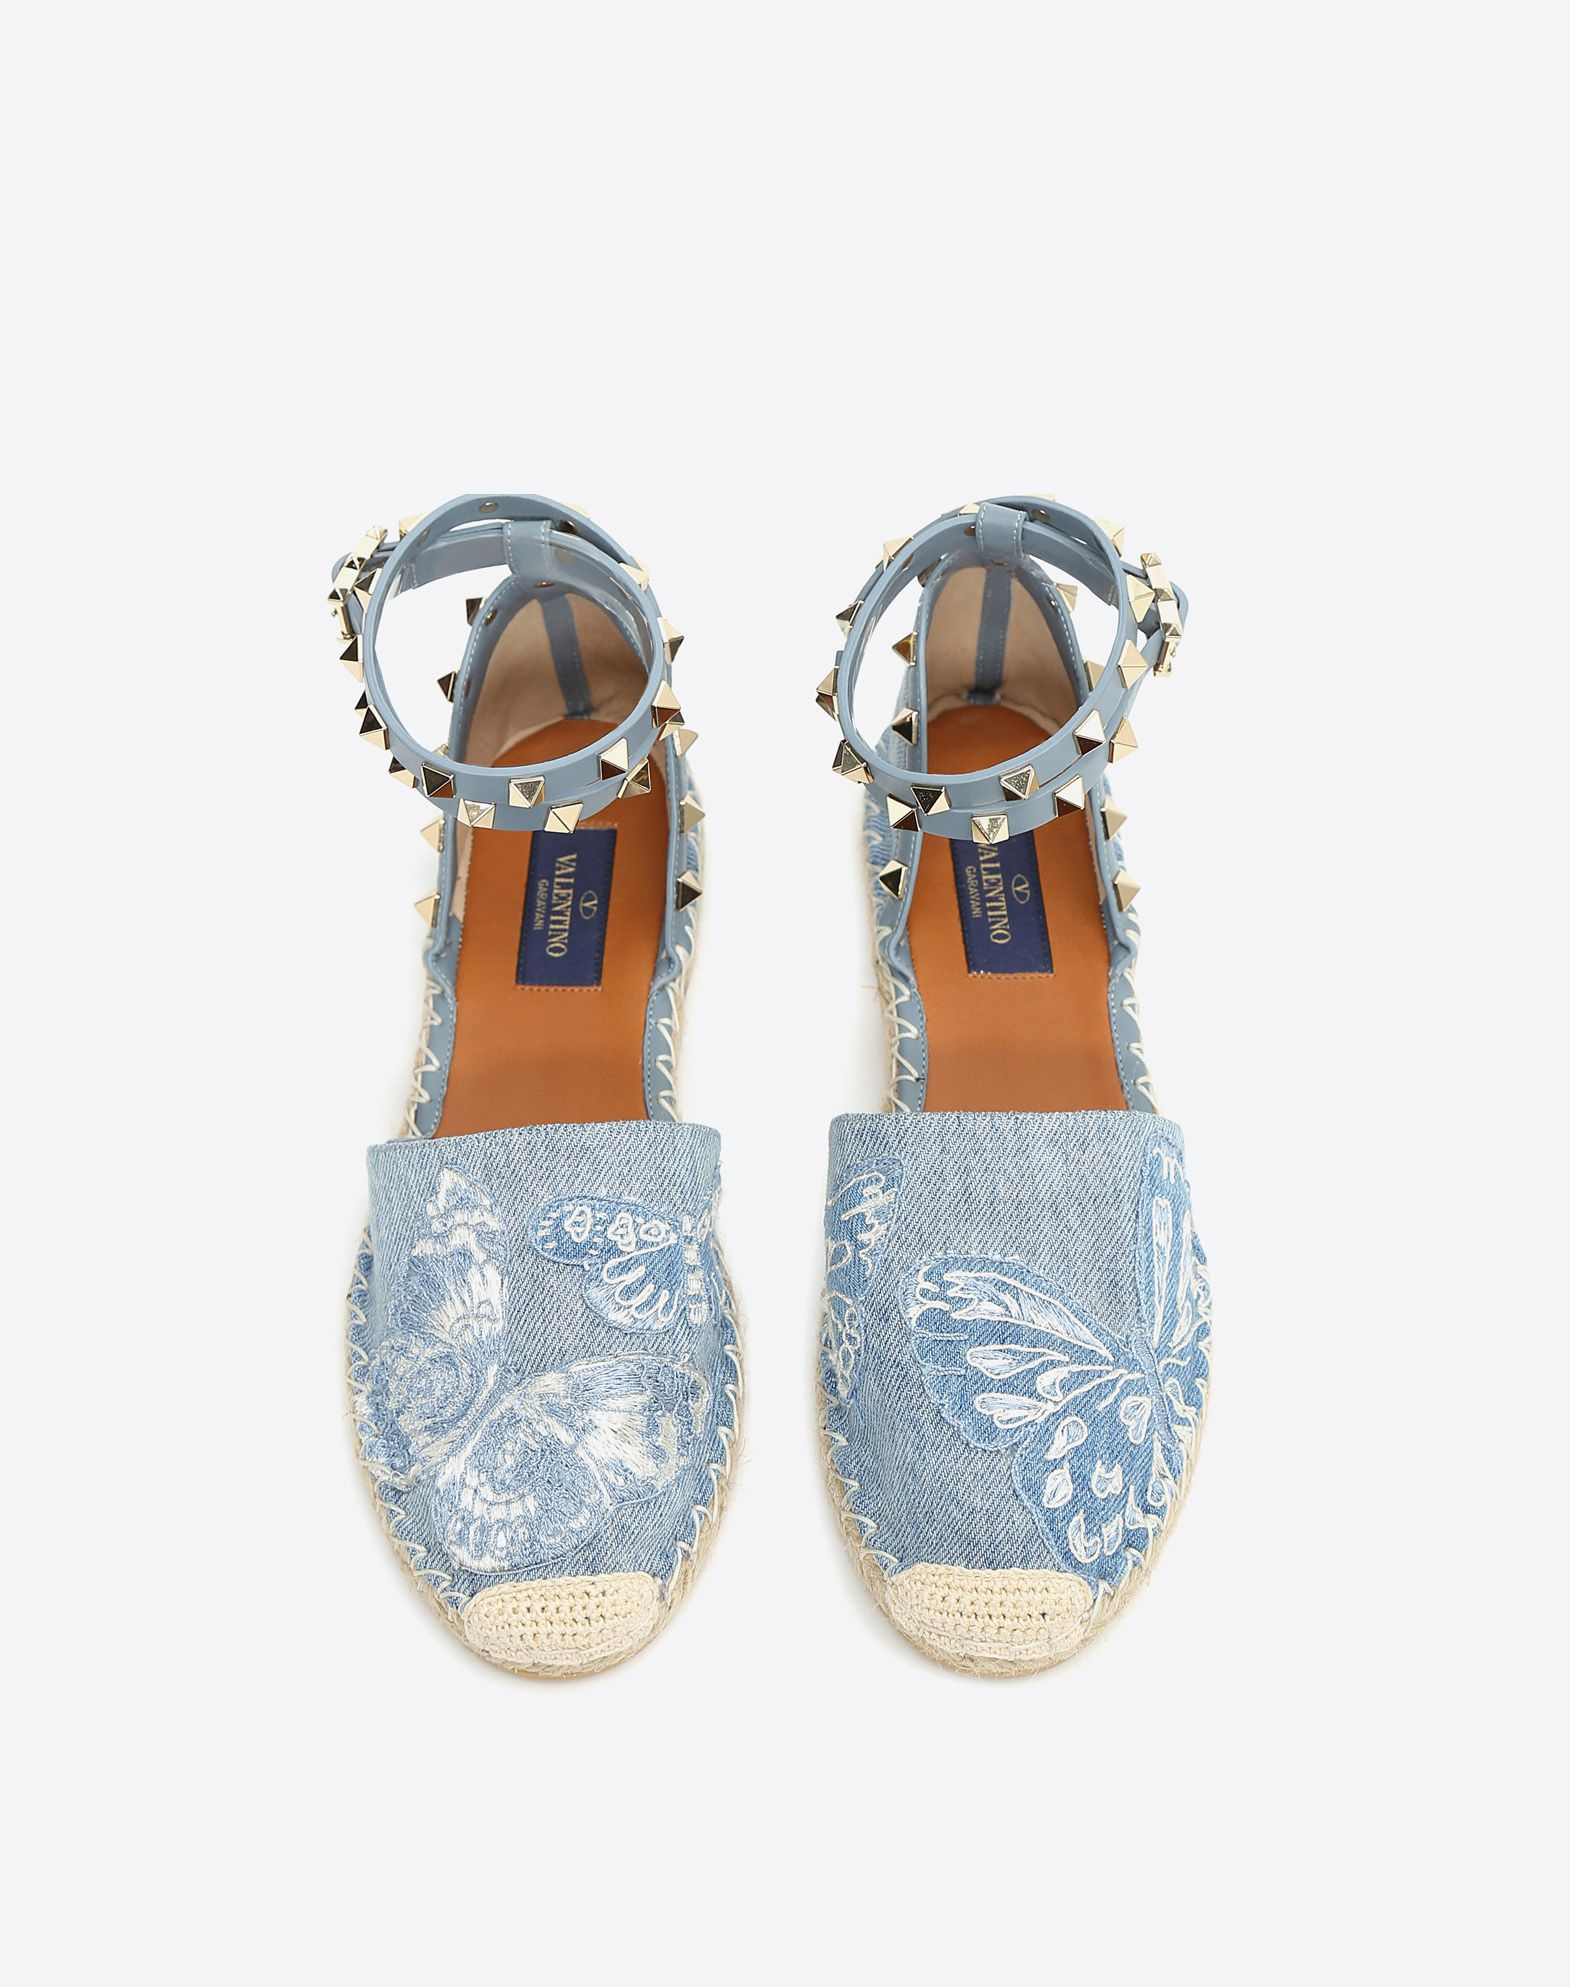 VALENTINO Rubber sole Denim Studs Square heel Buckling ankle strap closure Logo Round toeline  45338498pj